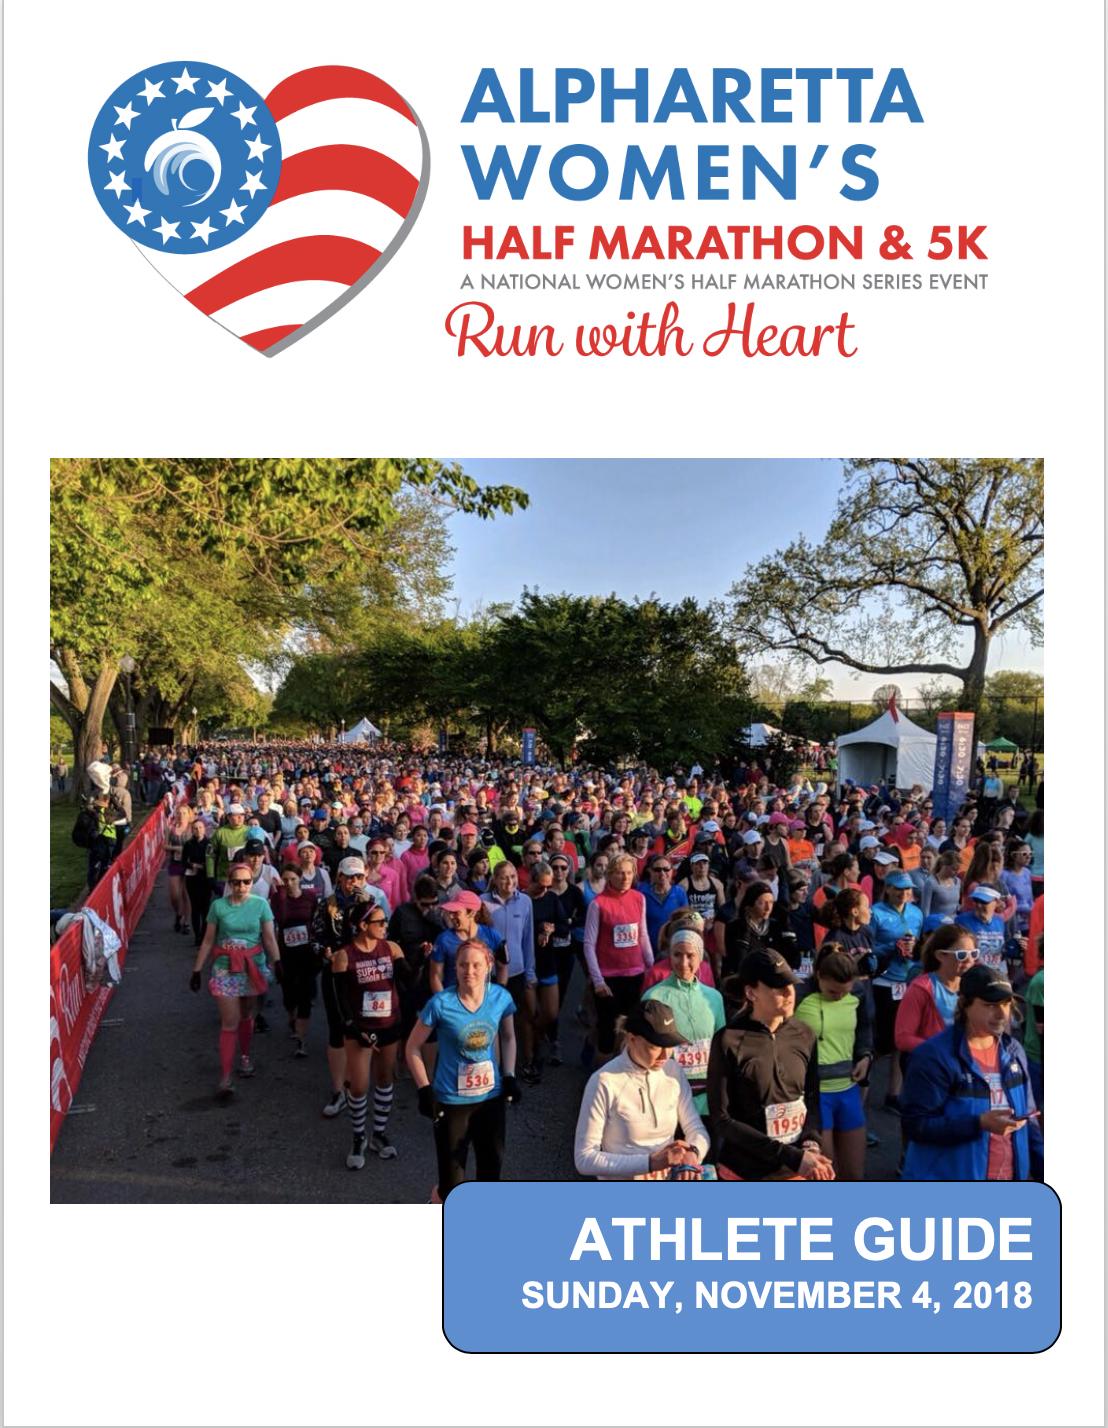 Alpharetta Women's Half Marathon and 5K Athlete Guide